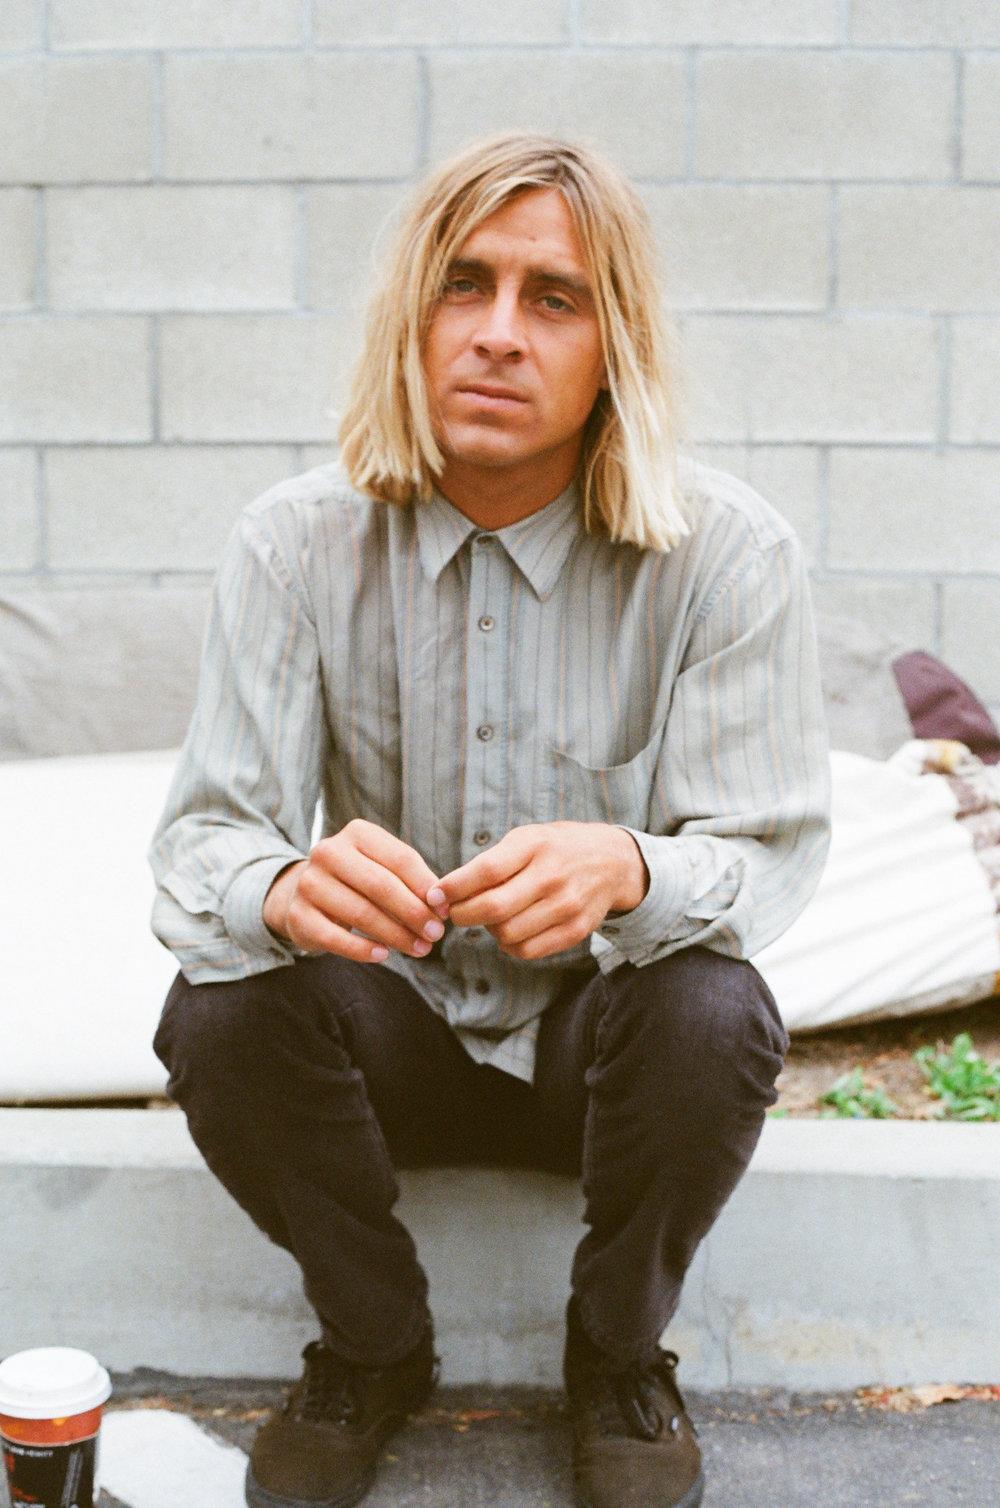 Alex Knost, hipsta guru. Porra, véio...